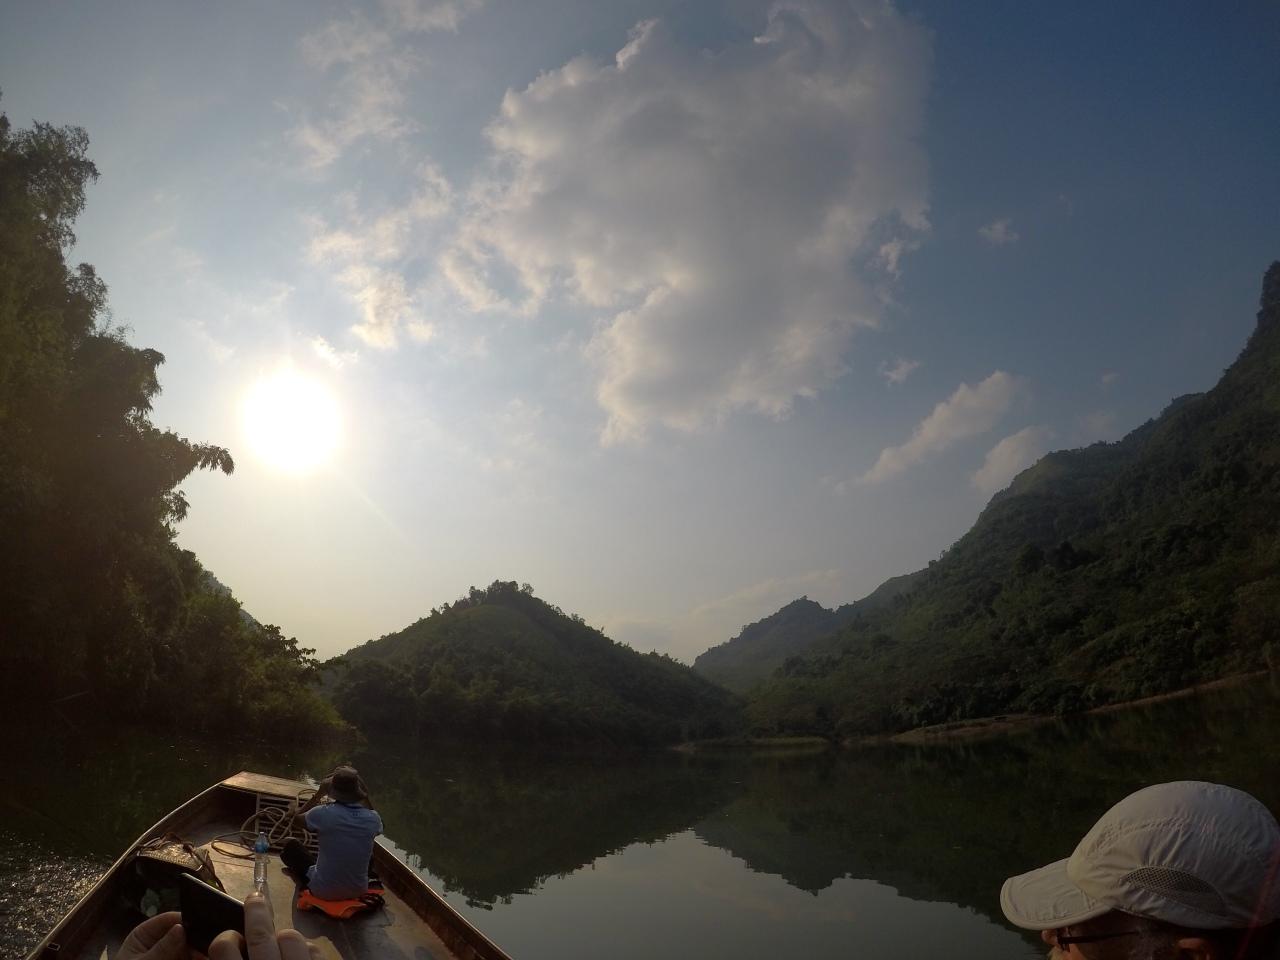 Boat journey to Da Bac